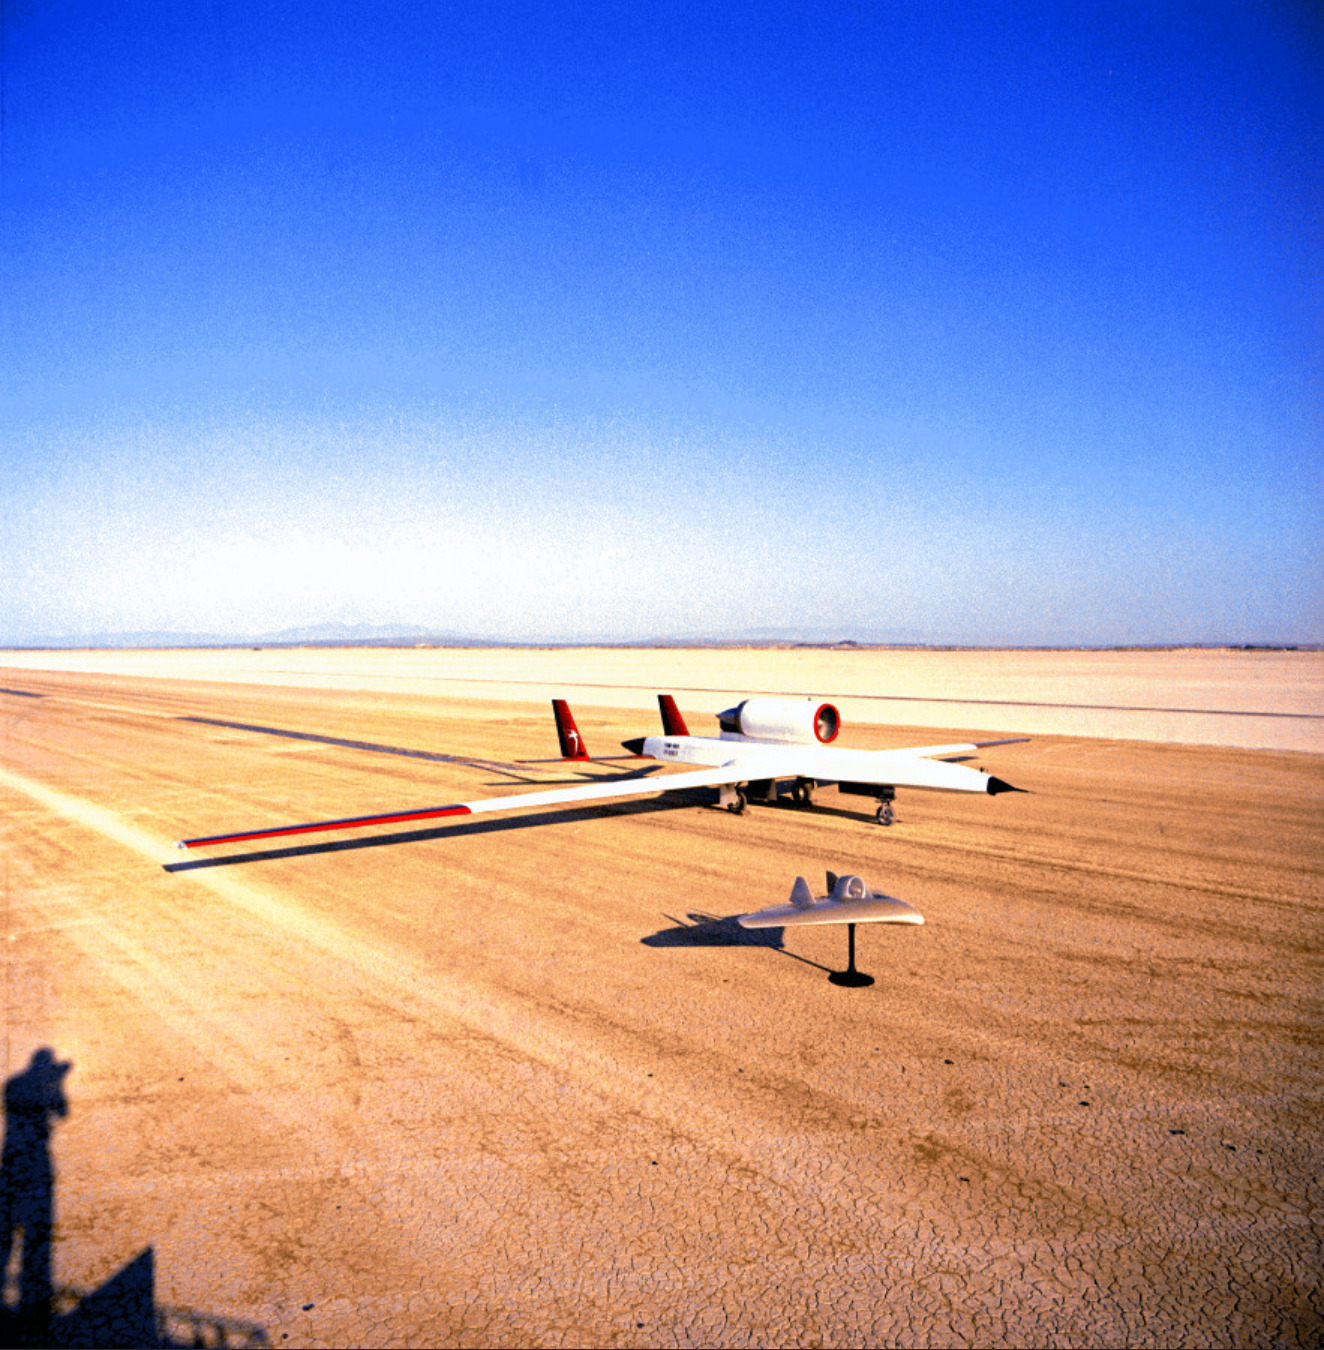 ryan_aeronautical_image.jpg